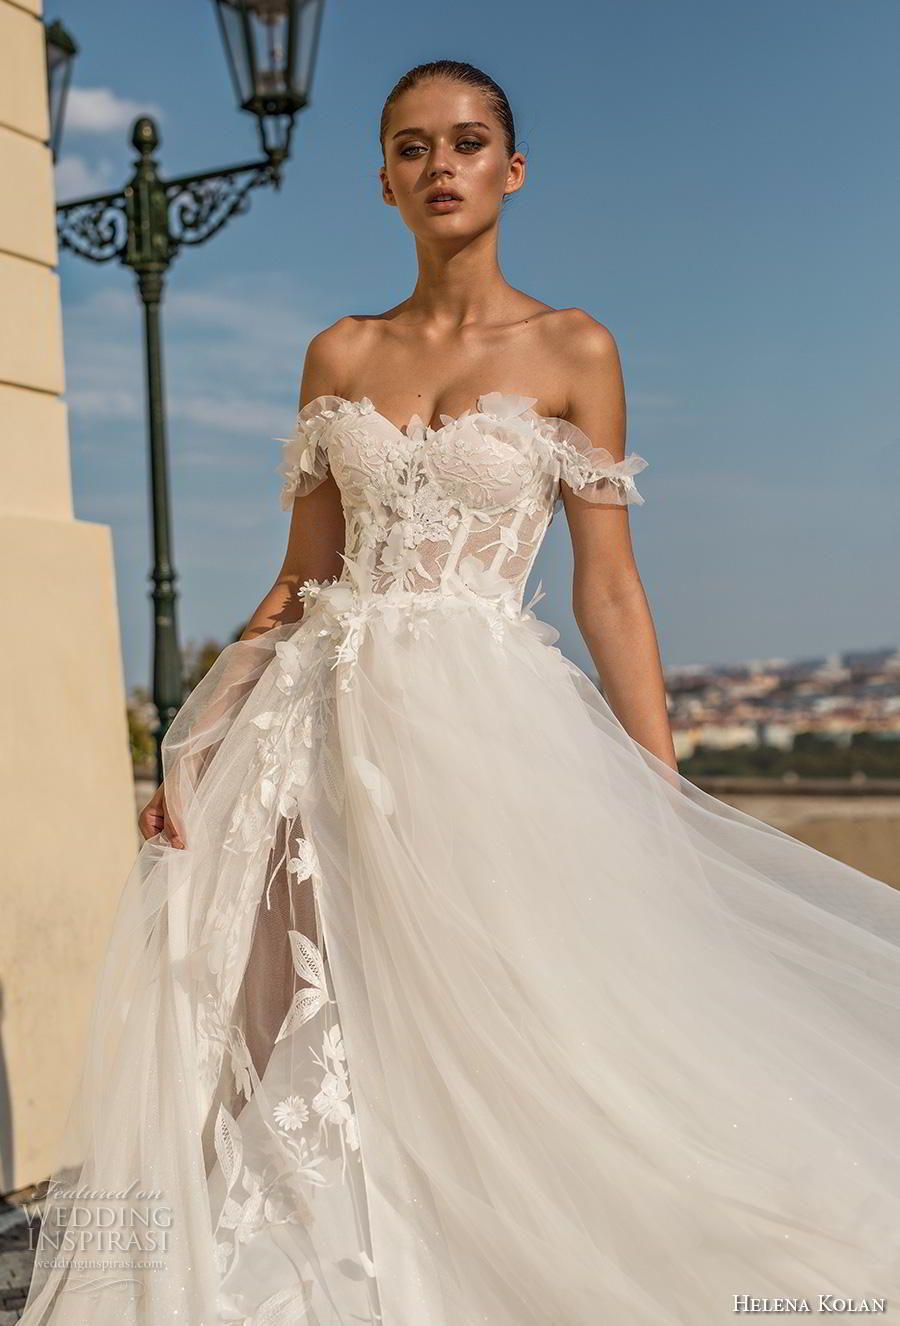 Night before wedding decorations january 2019 Helena Kolan  Wedding Dresses  Wedding  Pinterest  Slit skirt